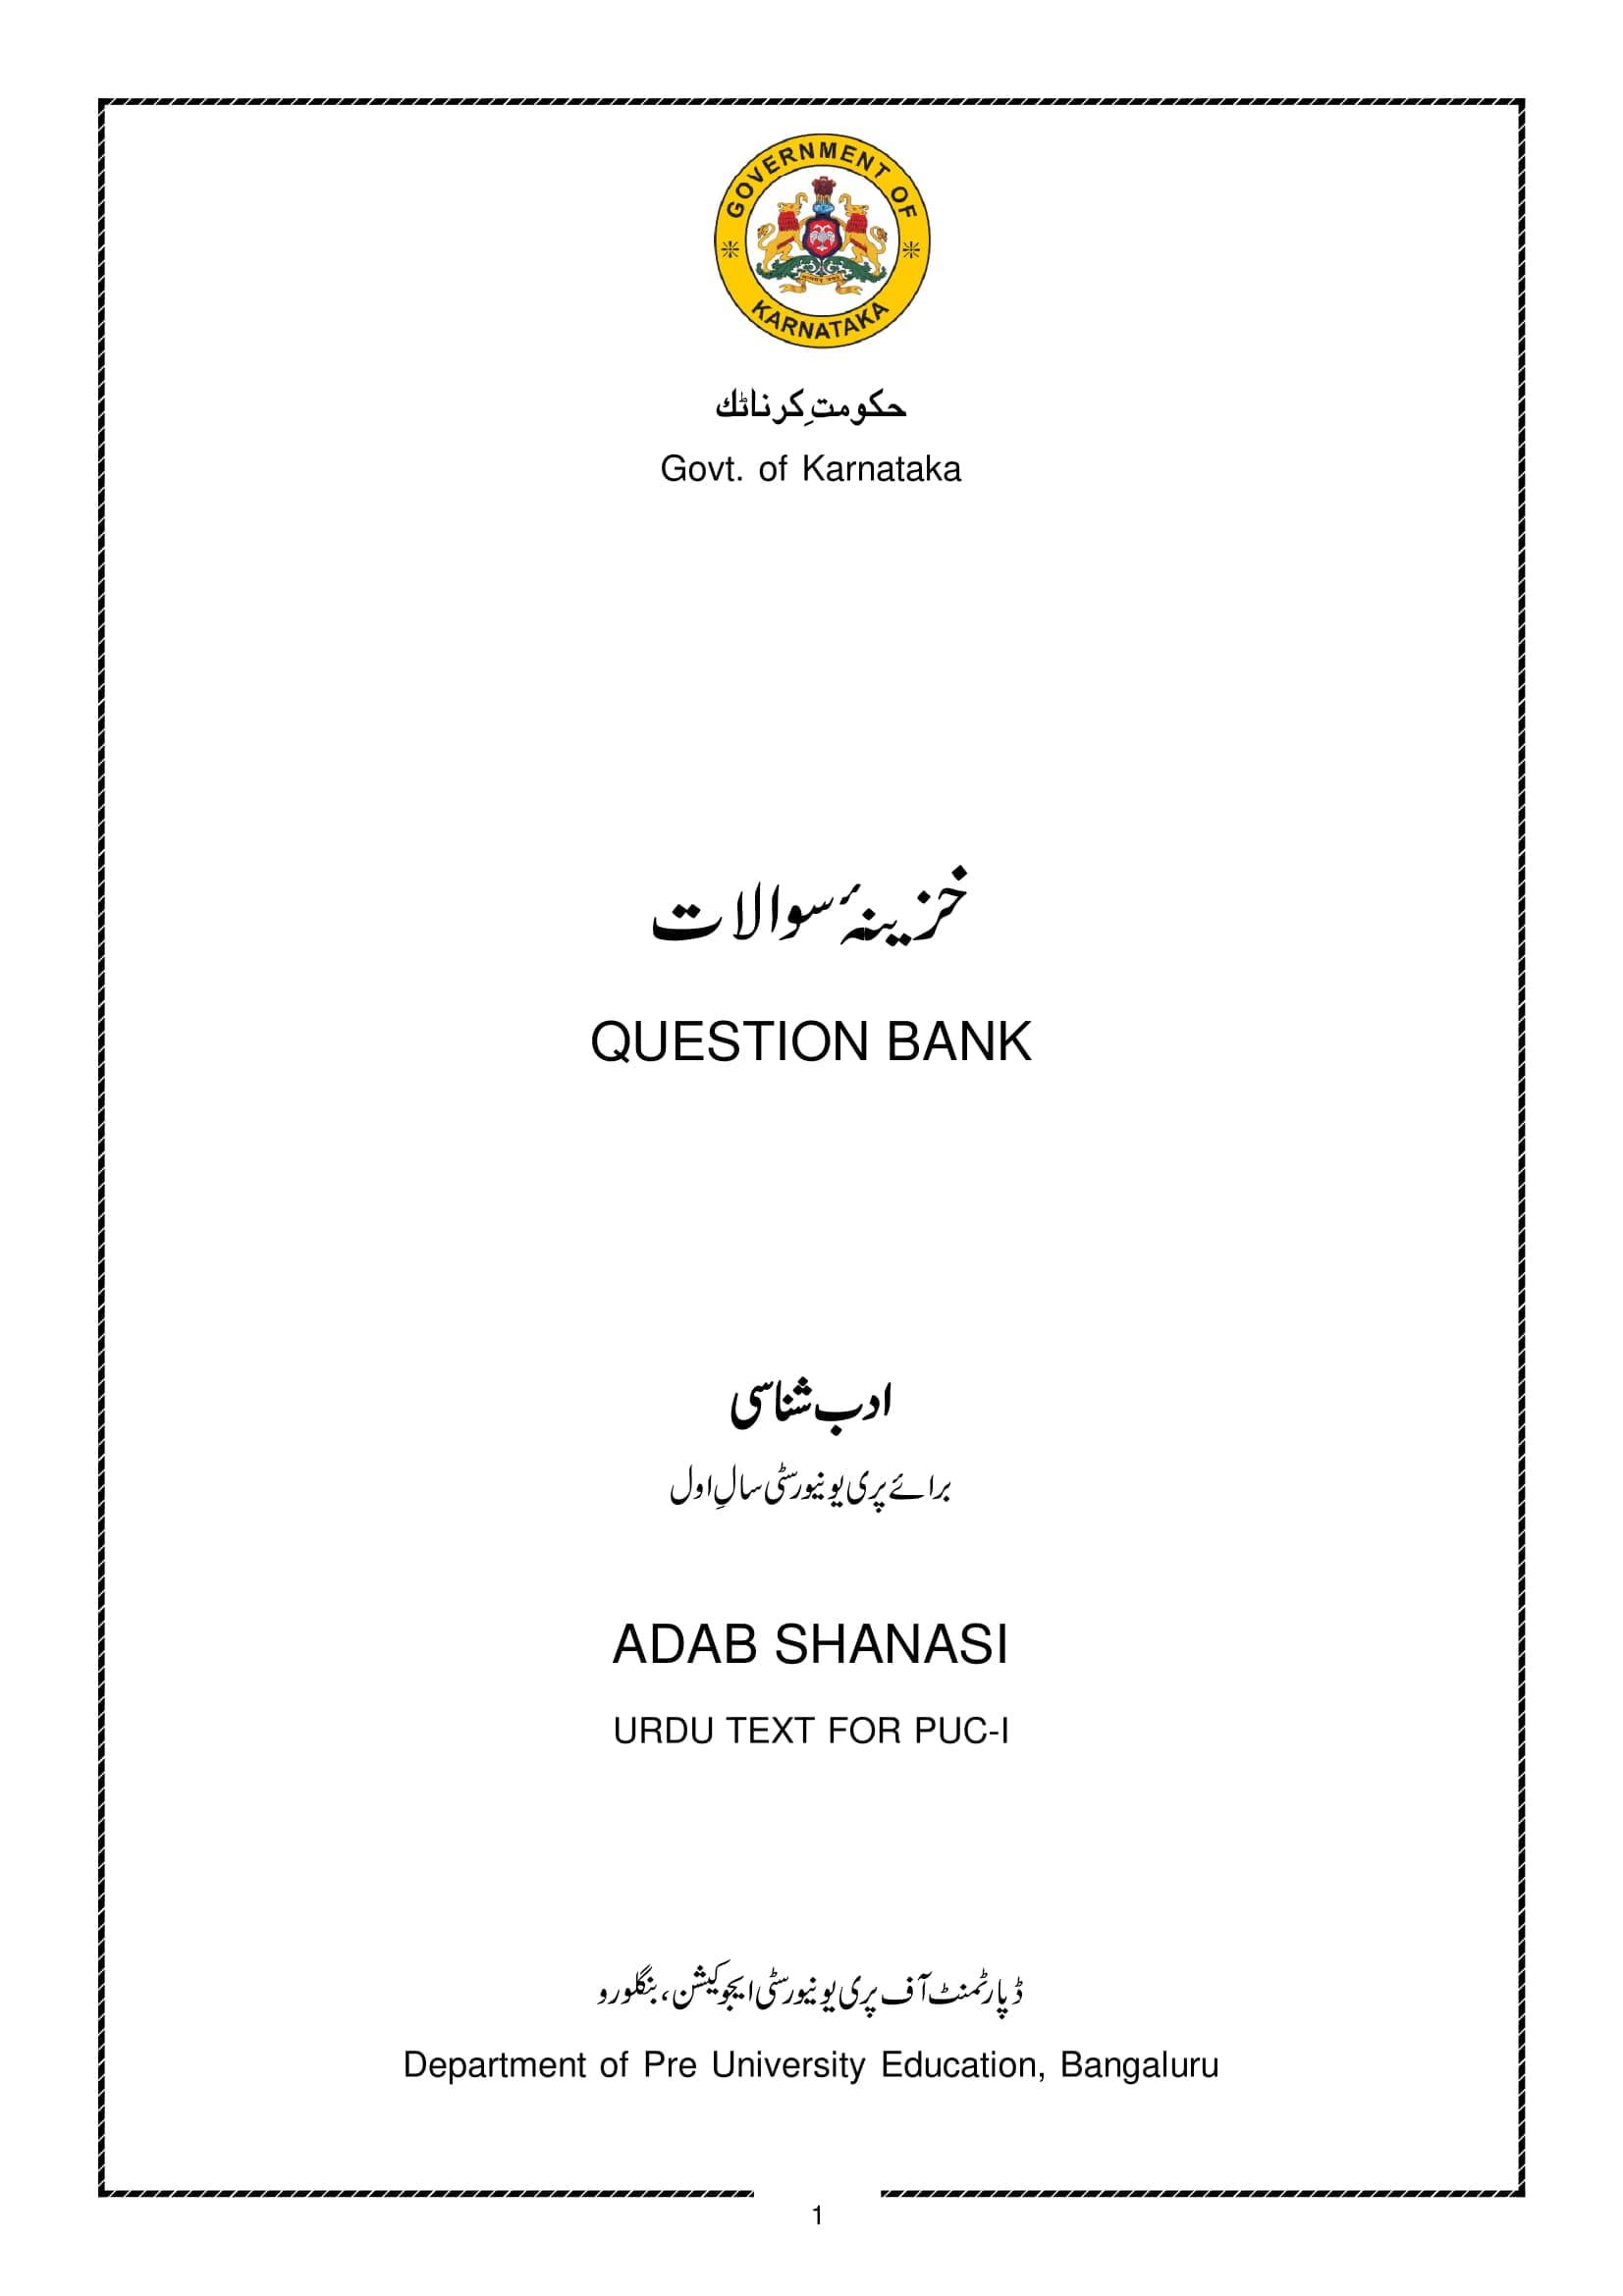 Karnataka 1st PUC Question Bank for Urdu 2017-18 - Page 1